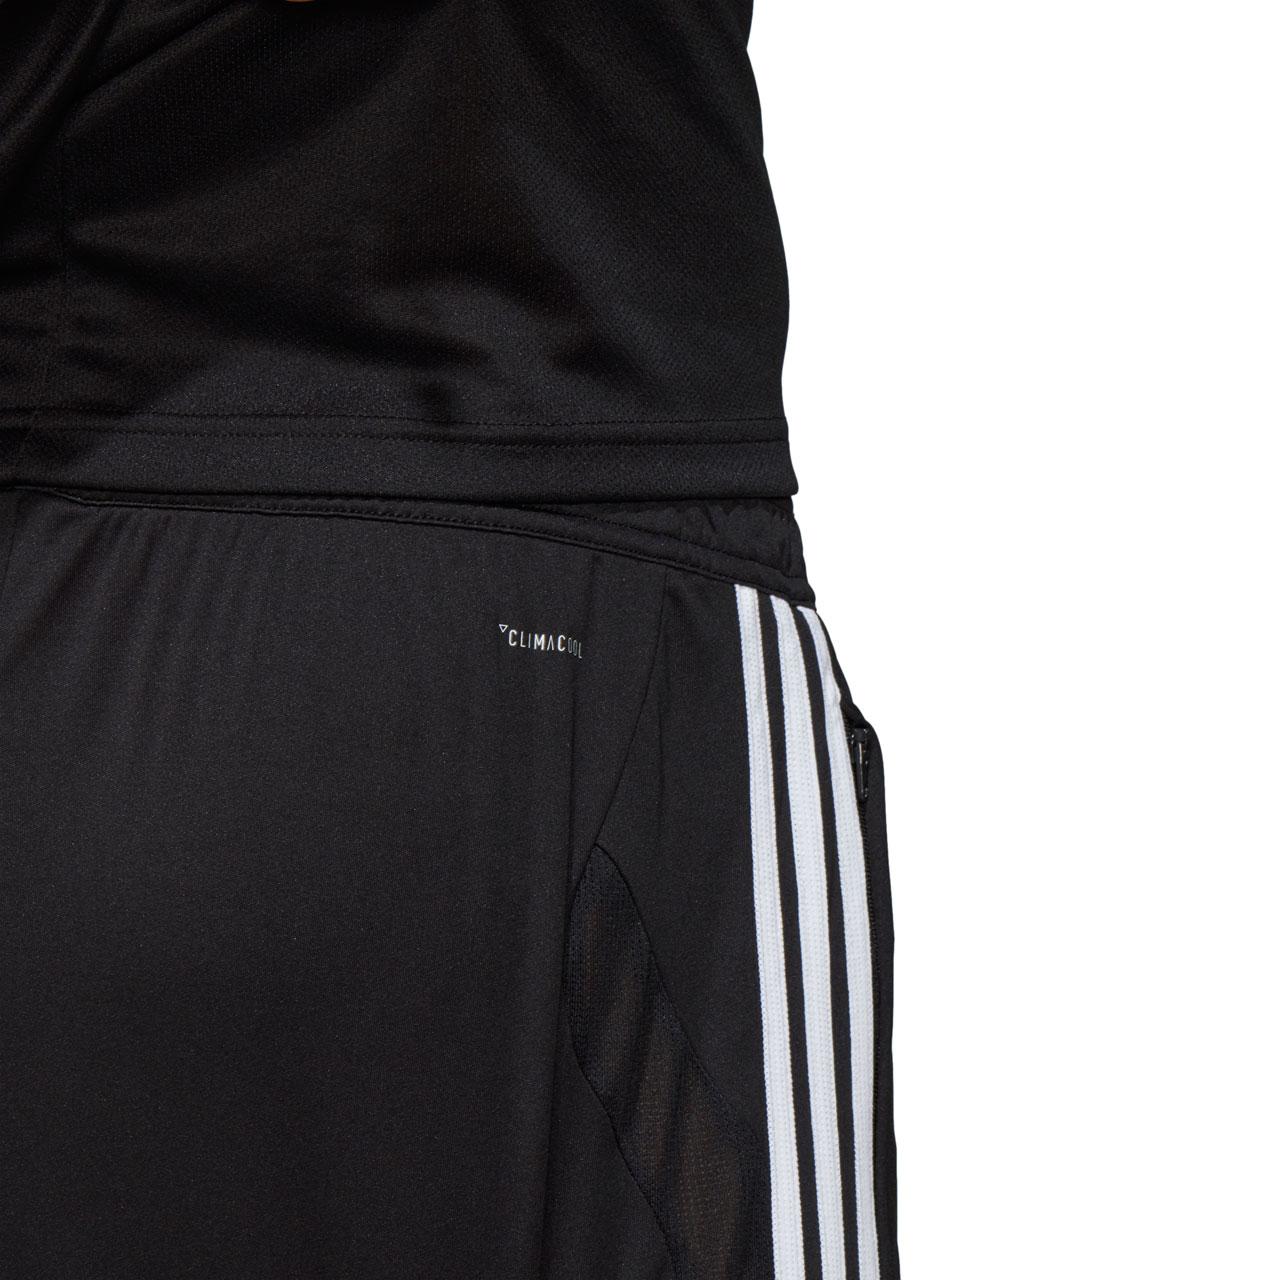 adidas TIRO19 34 Pants Trainingshose